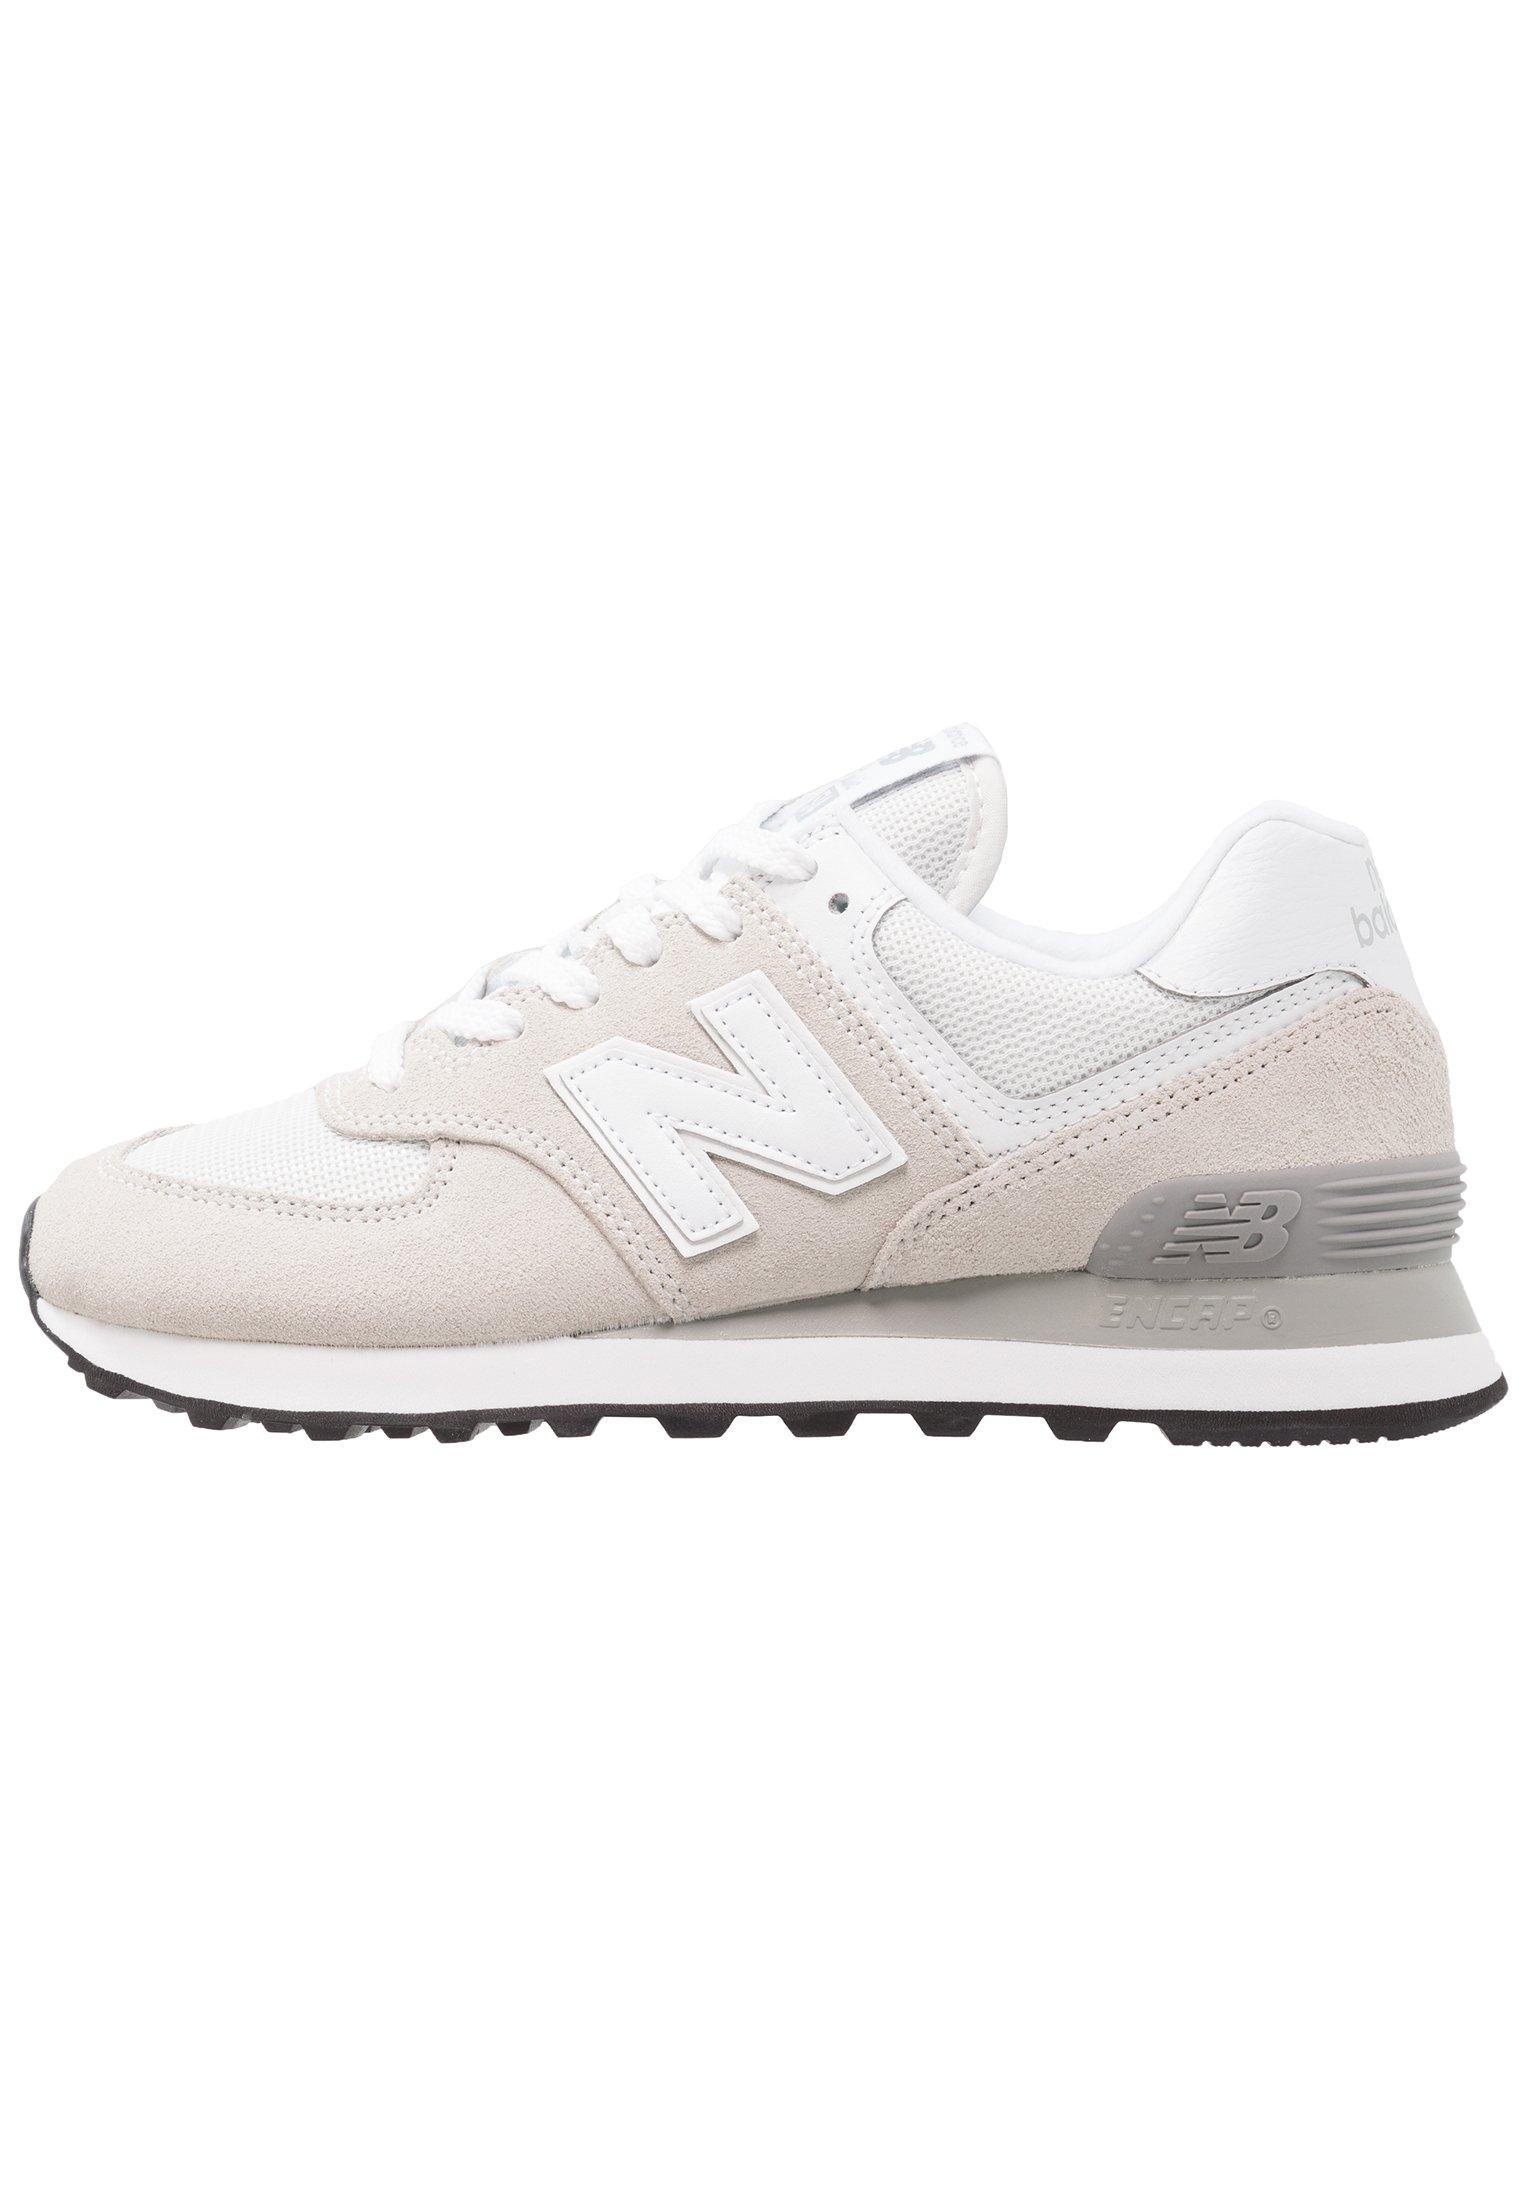 New Balance WL574 - Sneakers basse - white/bianco - Zalando.it